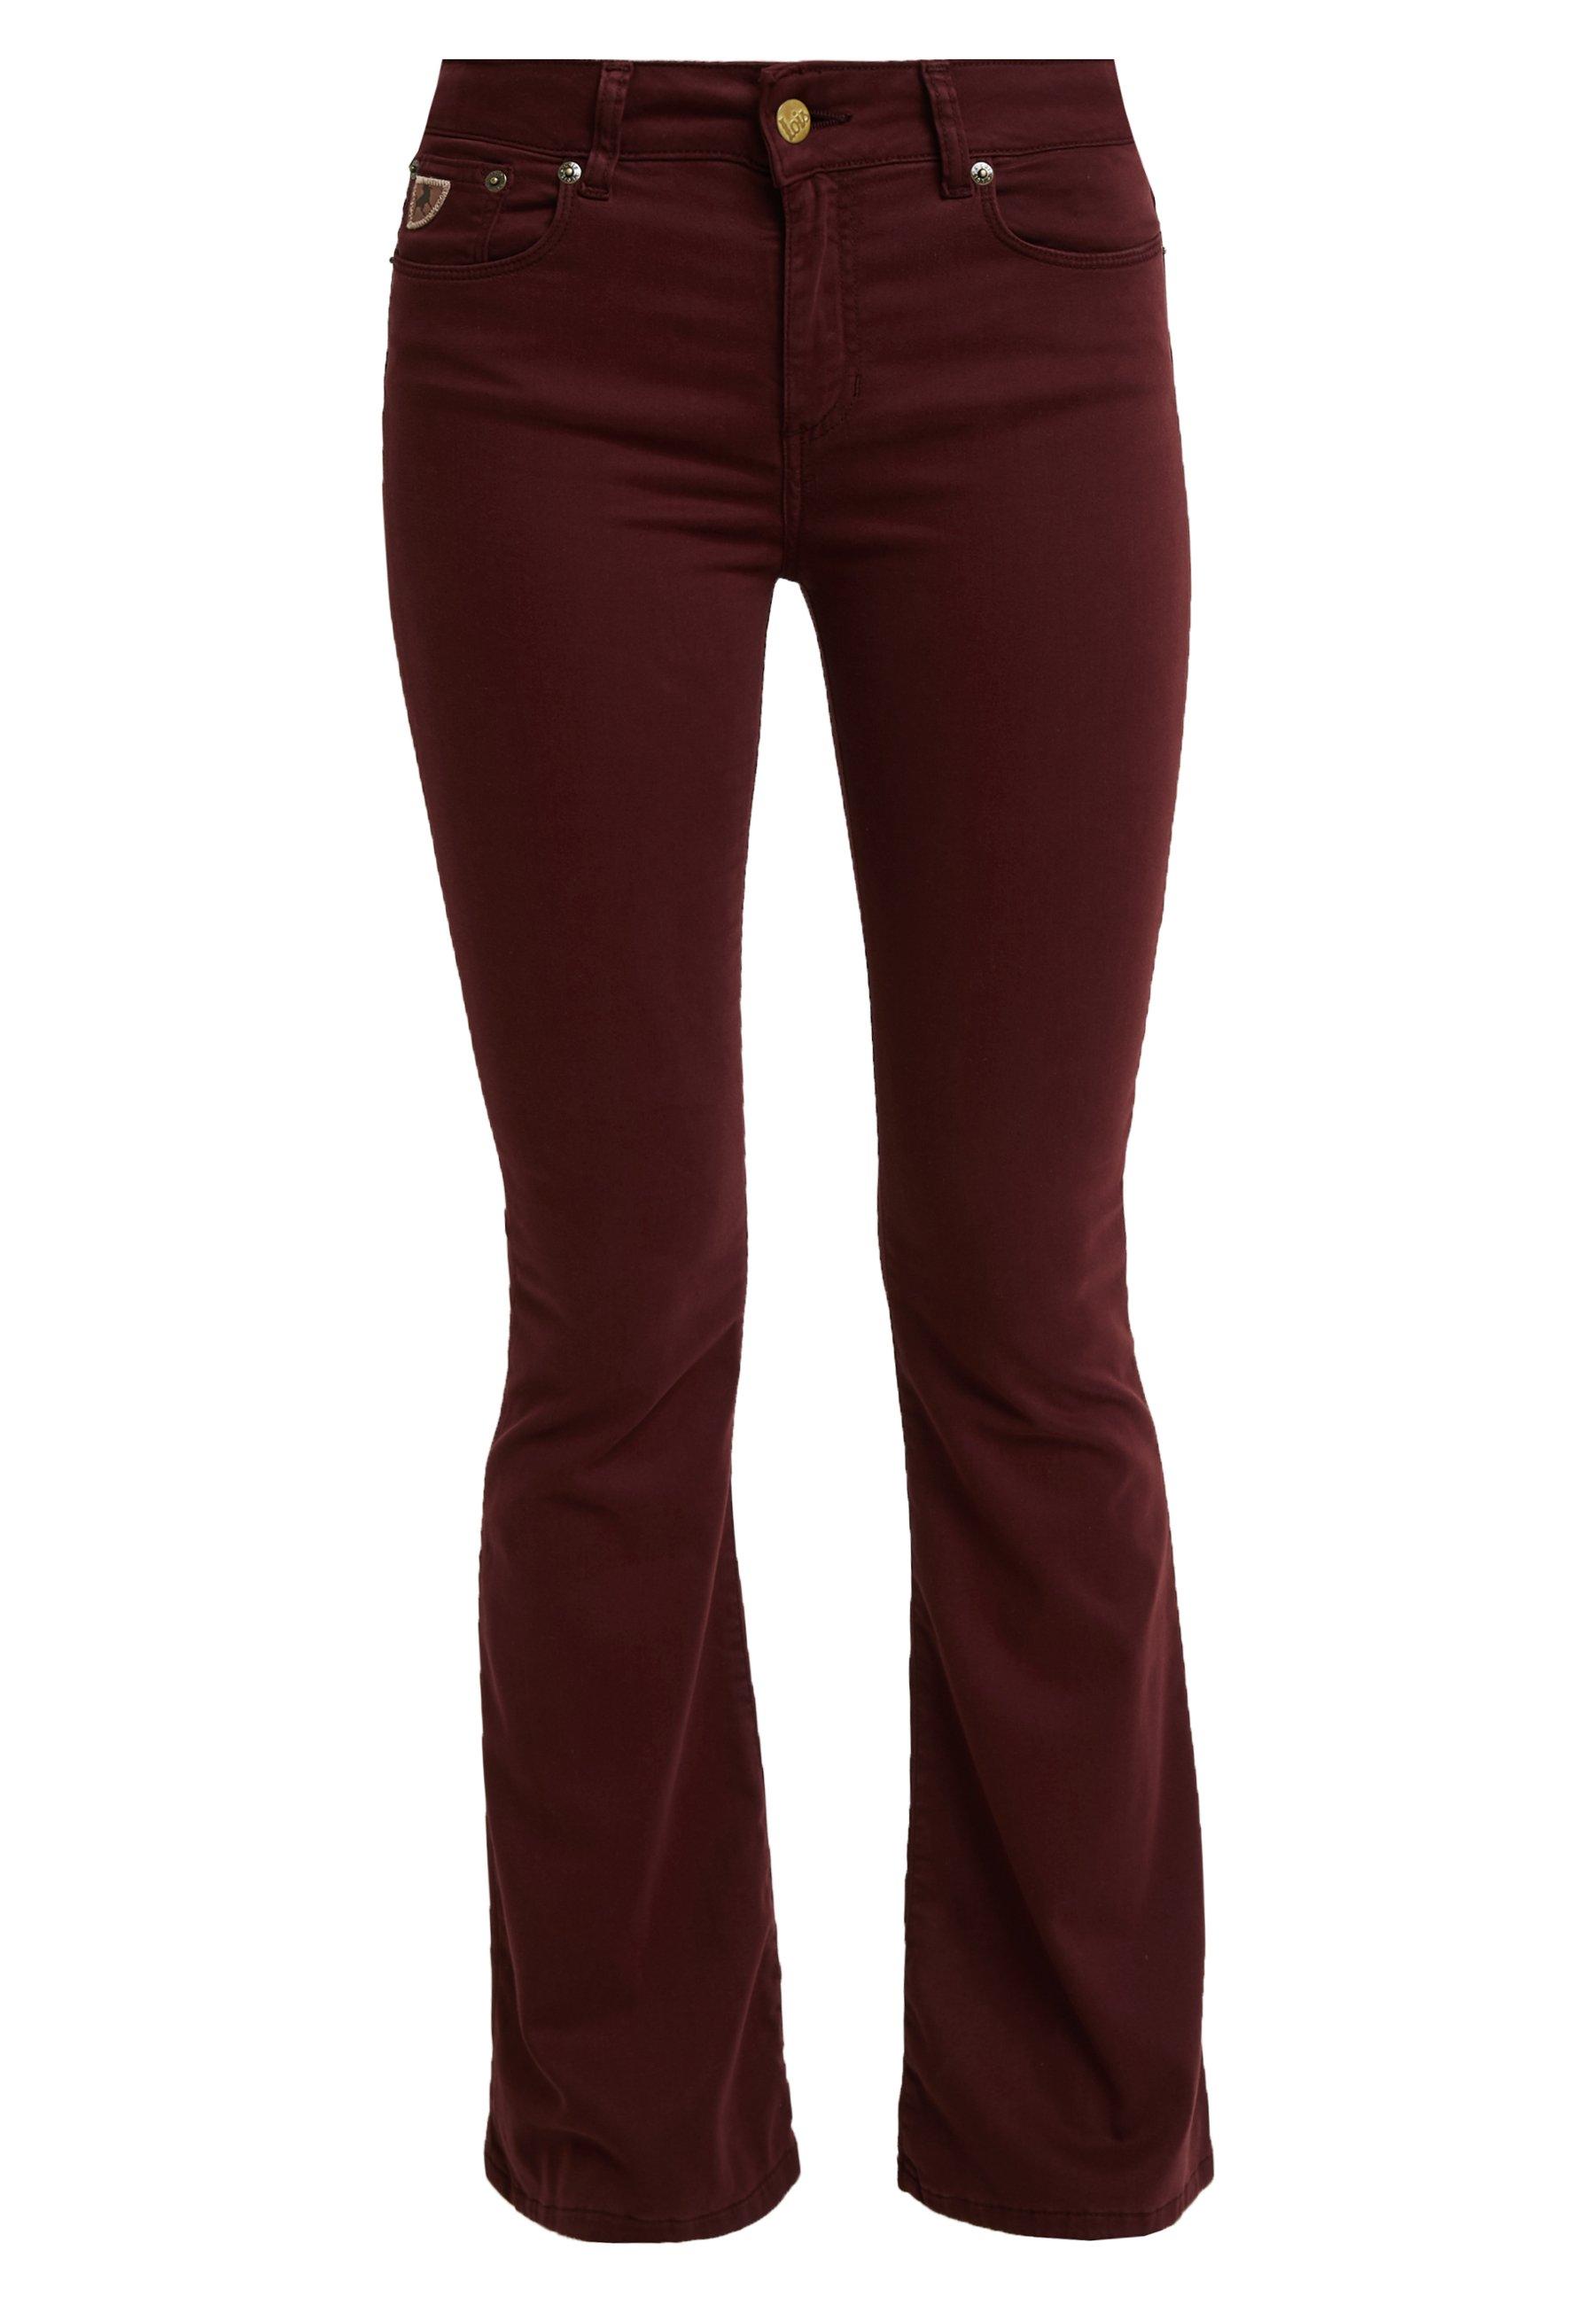 RAVAL Bukse burgundy